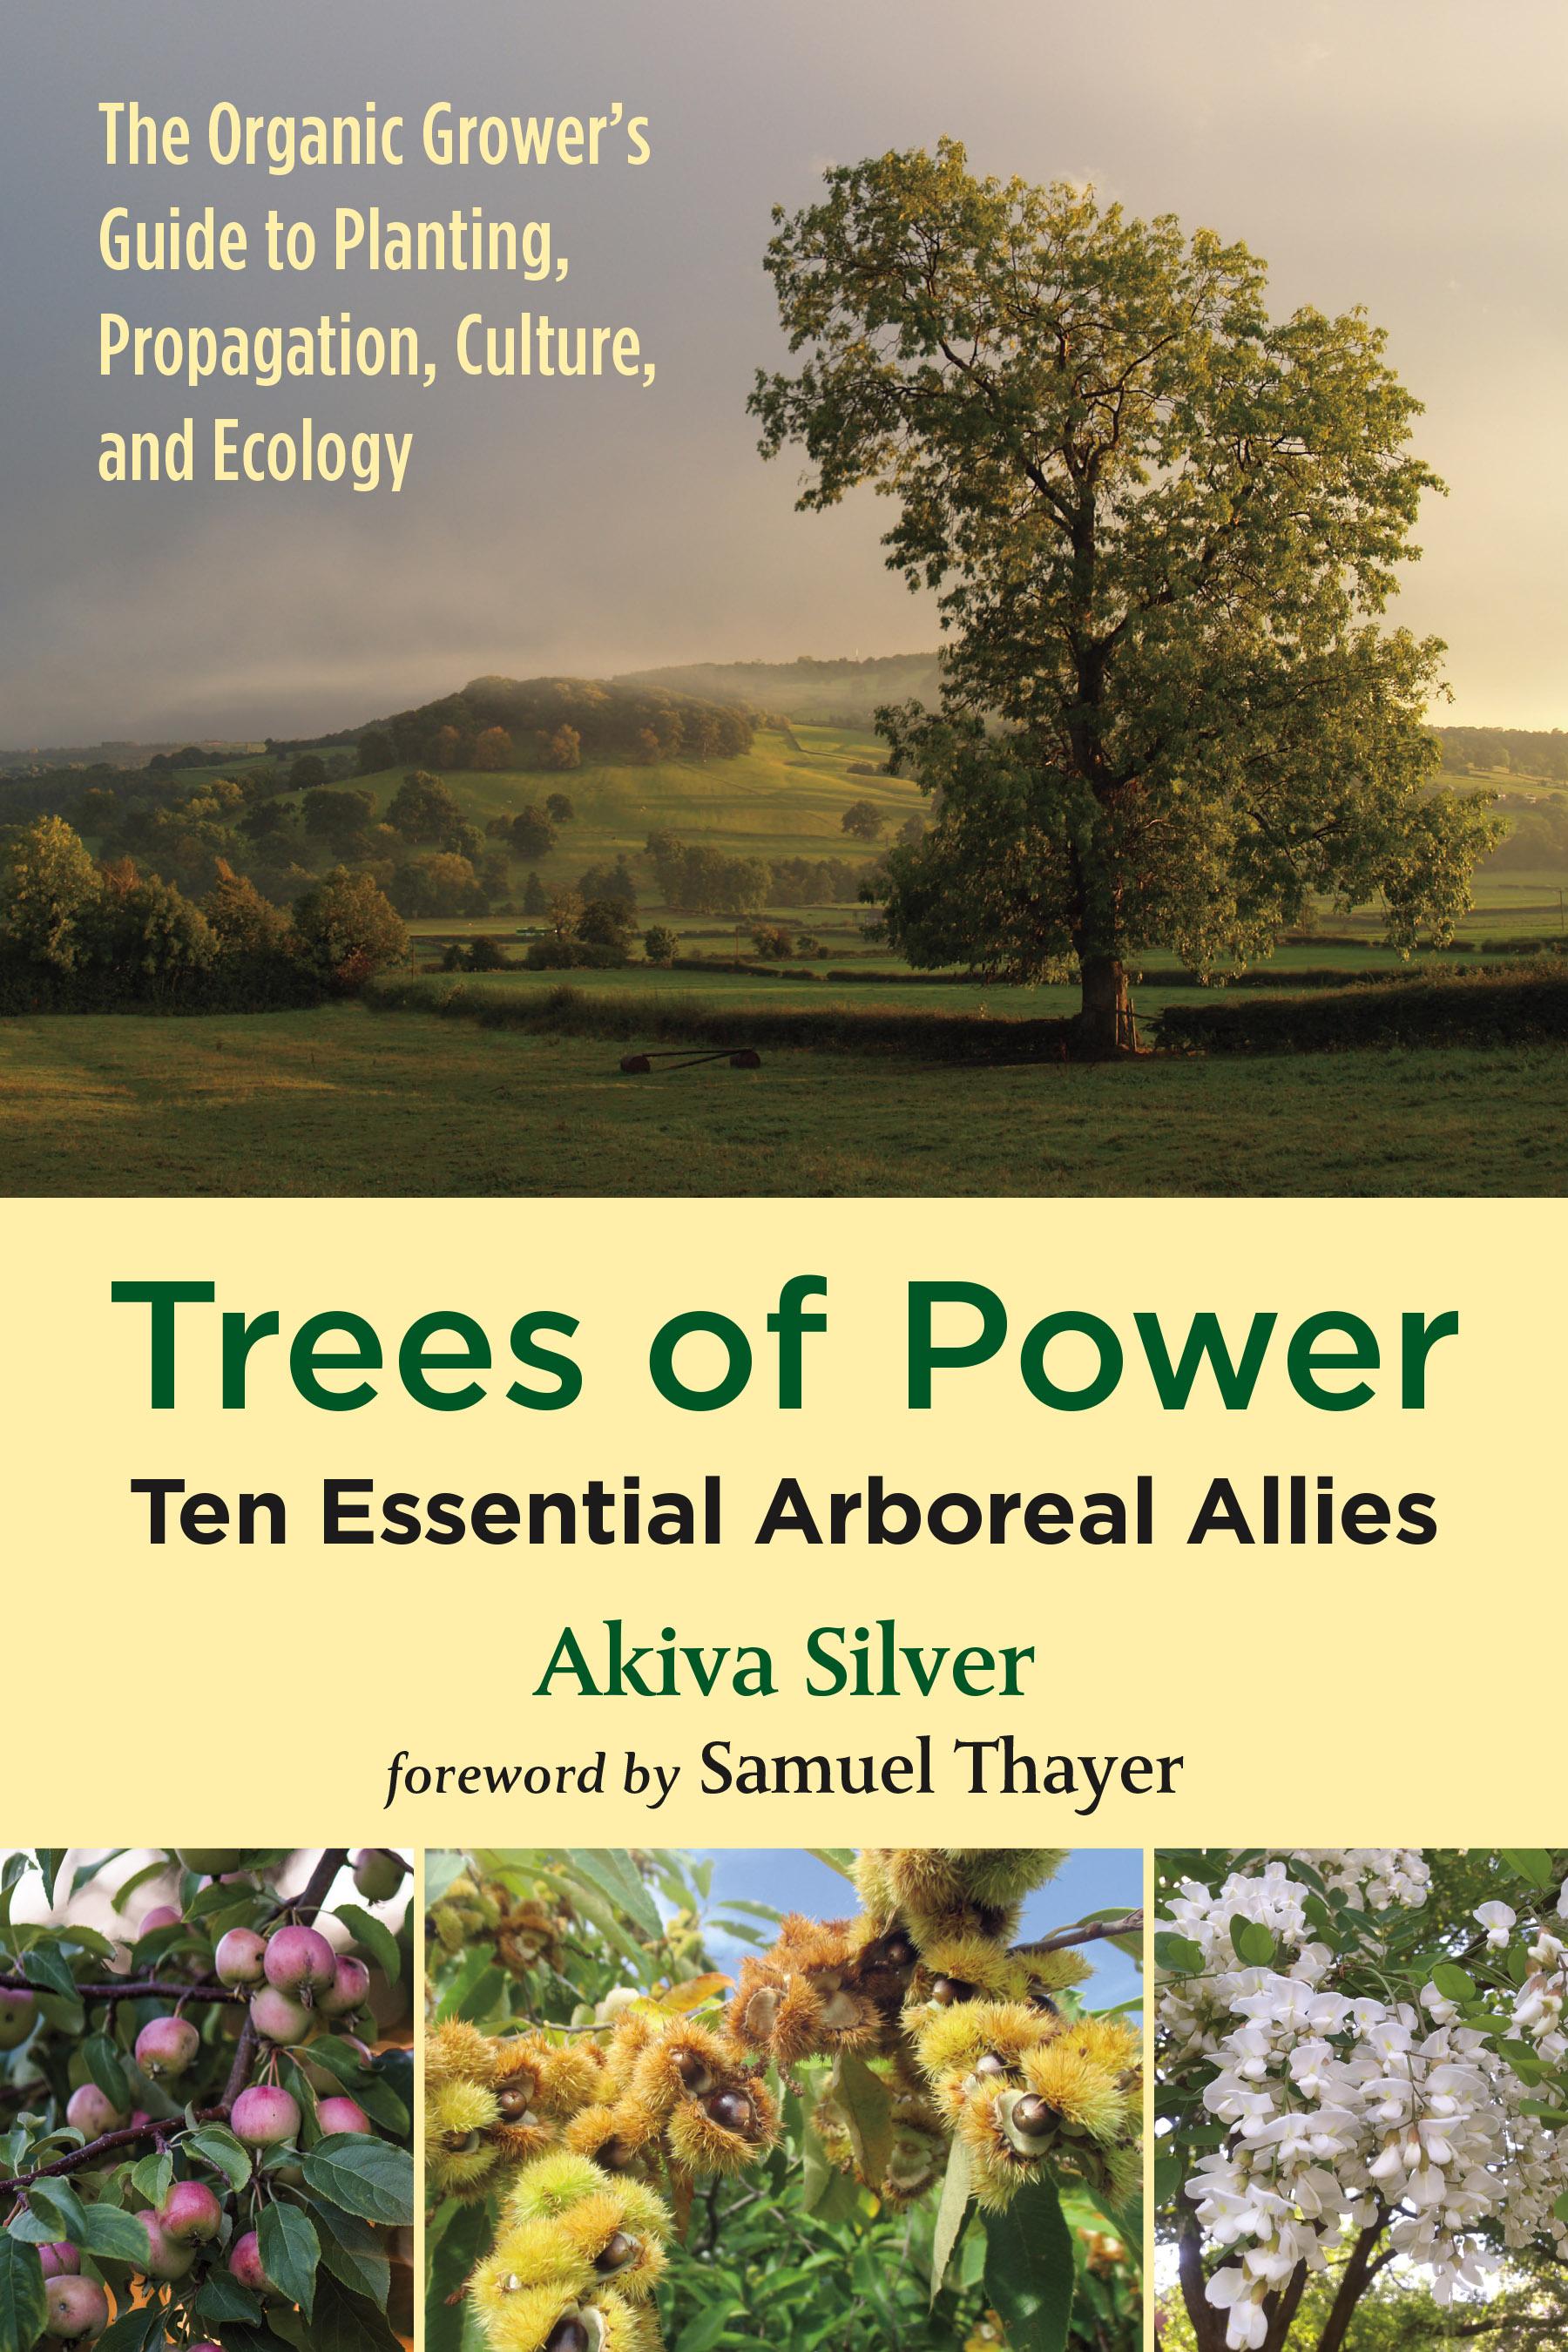 TreesPower_cover[1].jpg